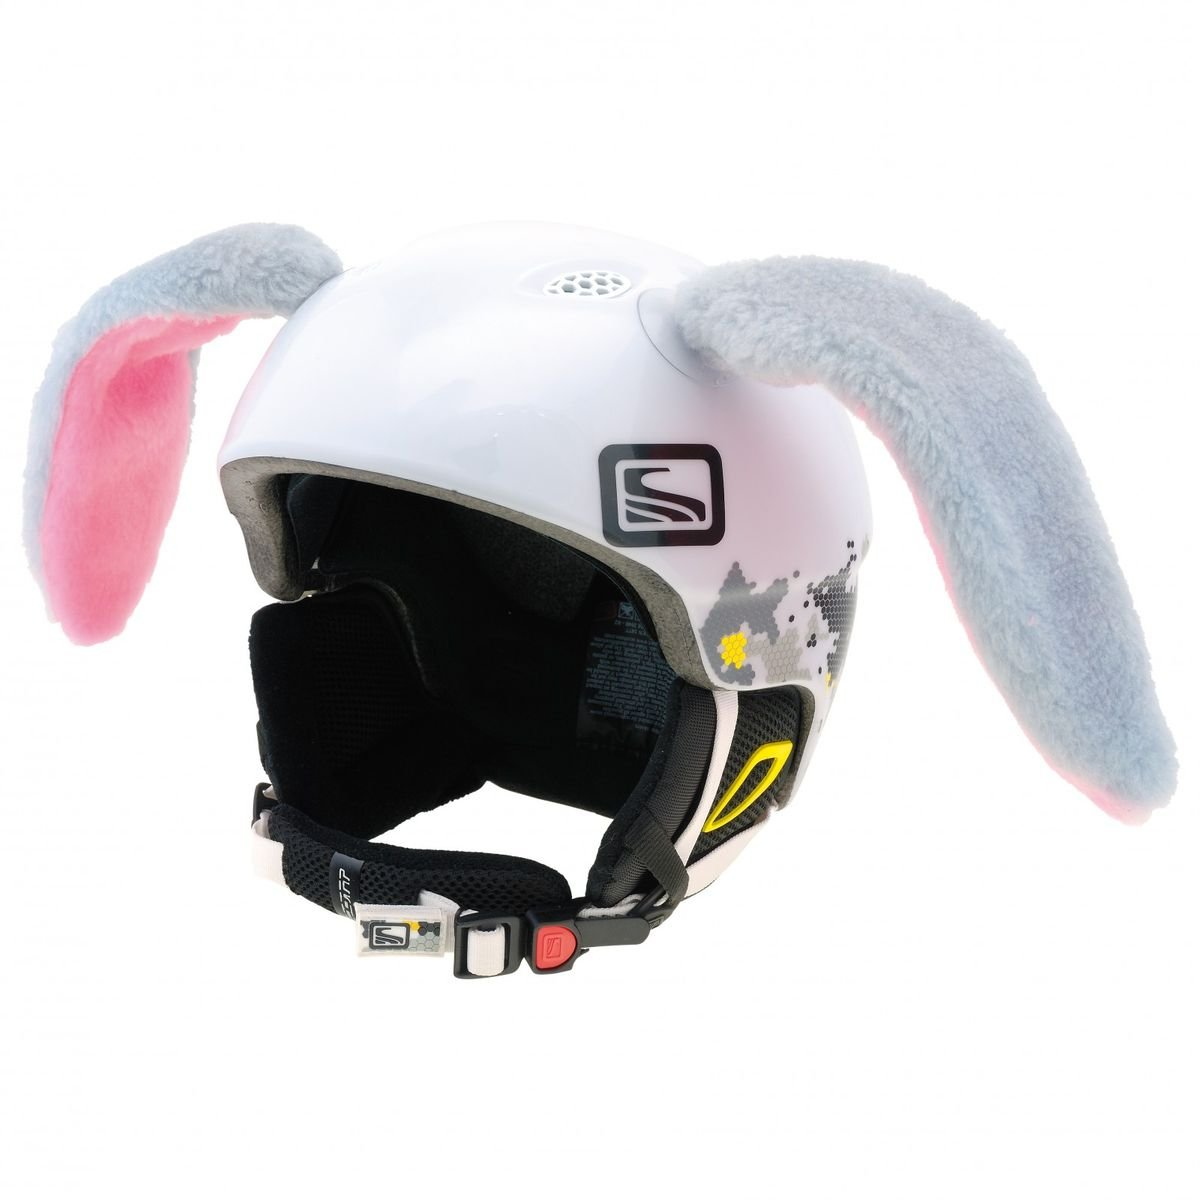 Crazy Ears Helm-Accessoires Hase Hund Ohren Ski-Ohren Tierohren